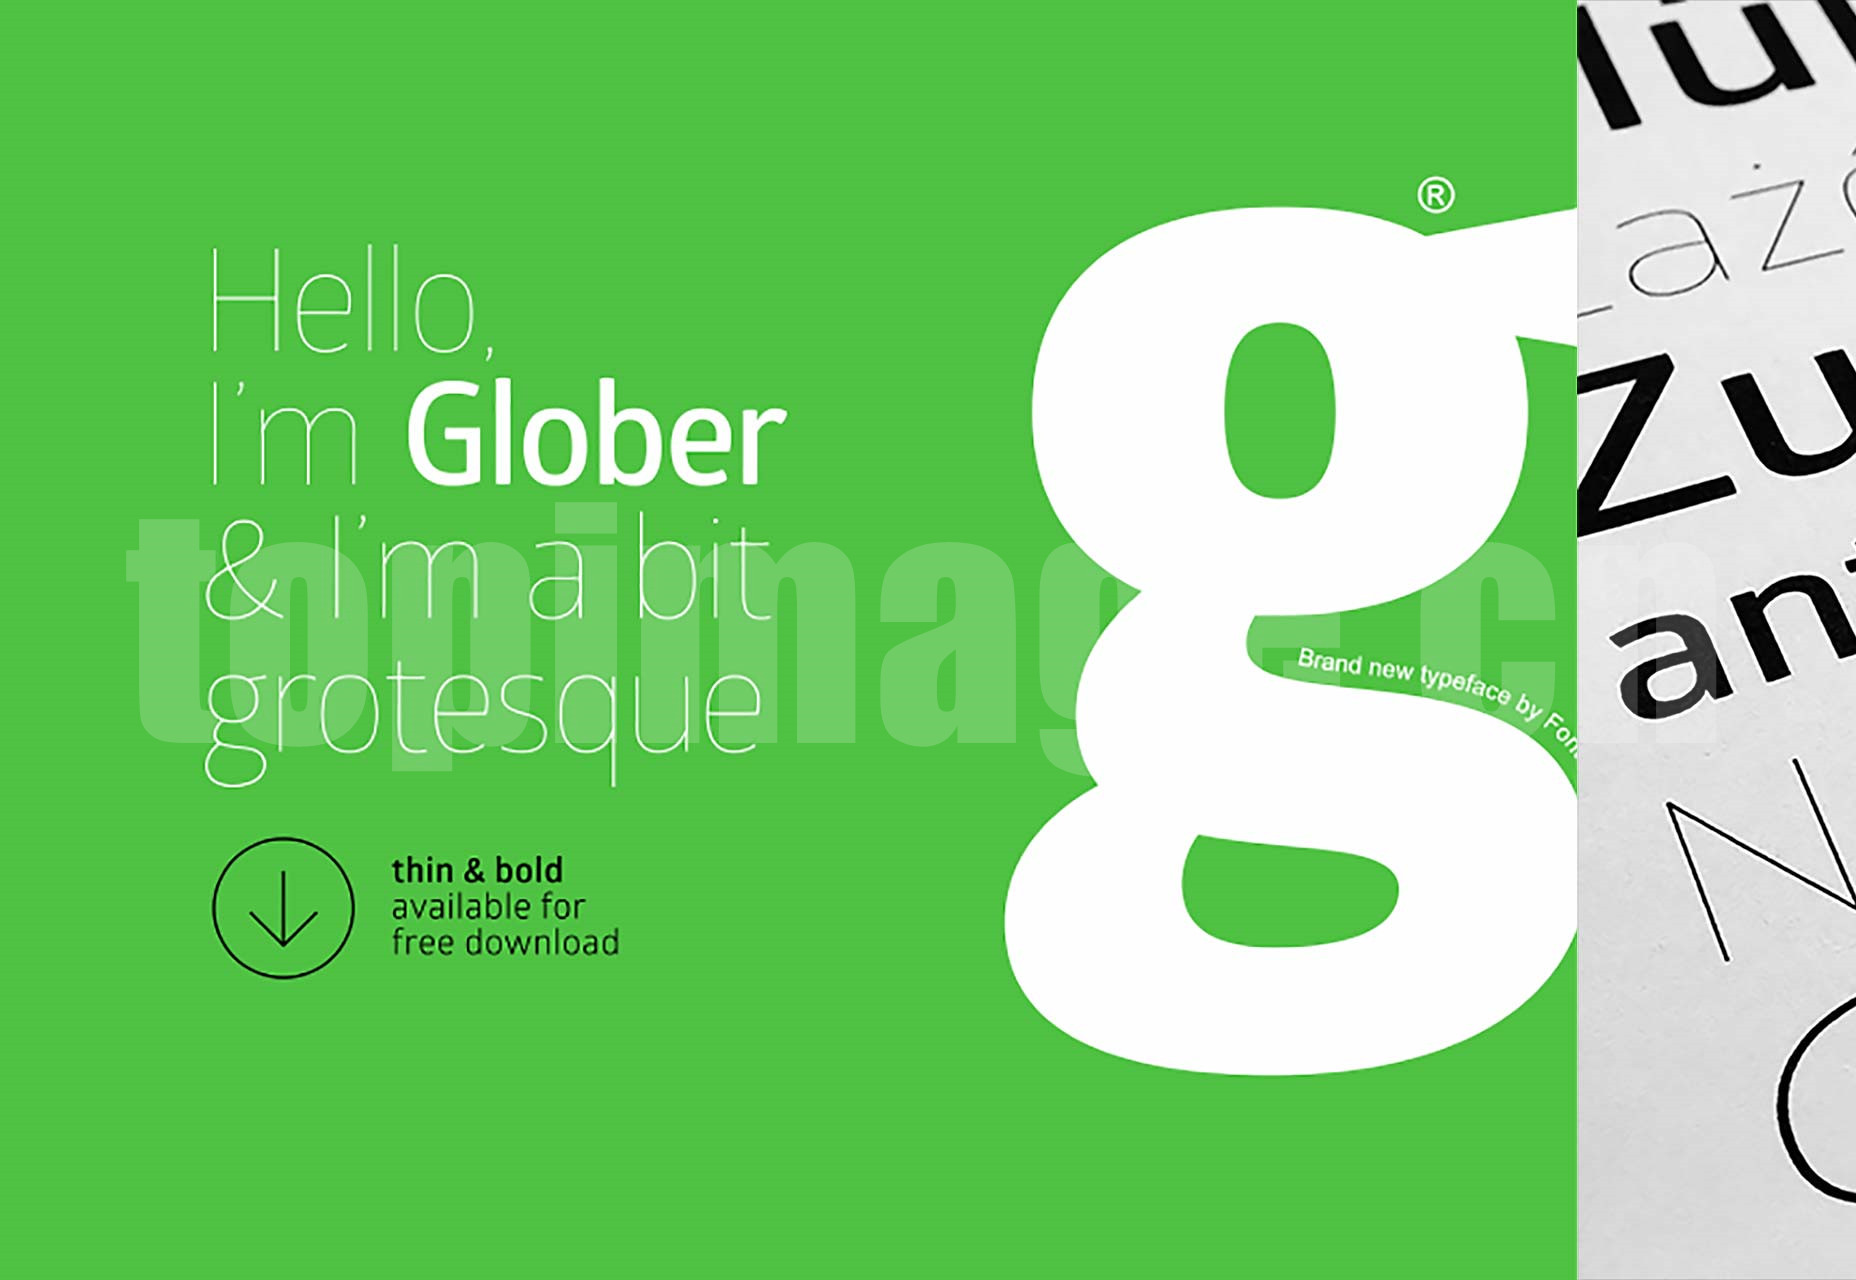 Glober海报创意 简洁纤细 logo英文字体下载